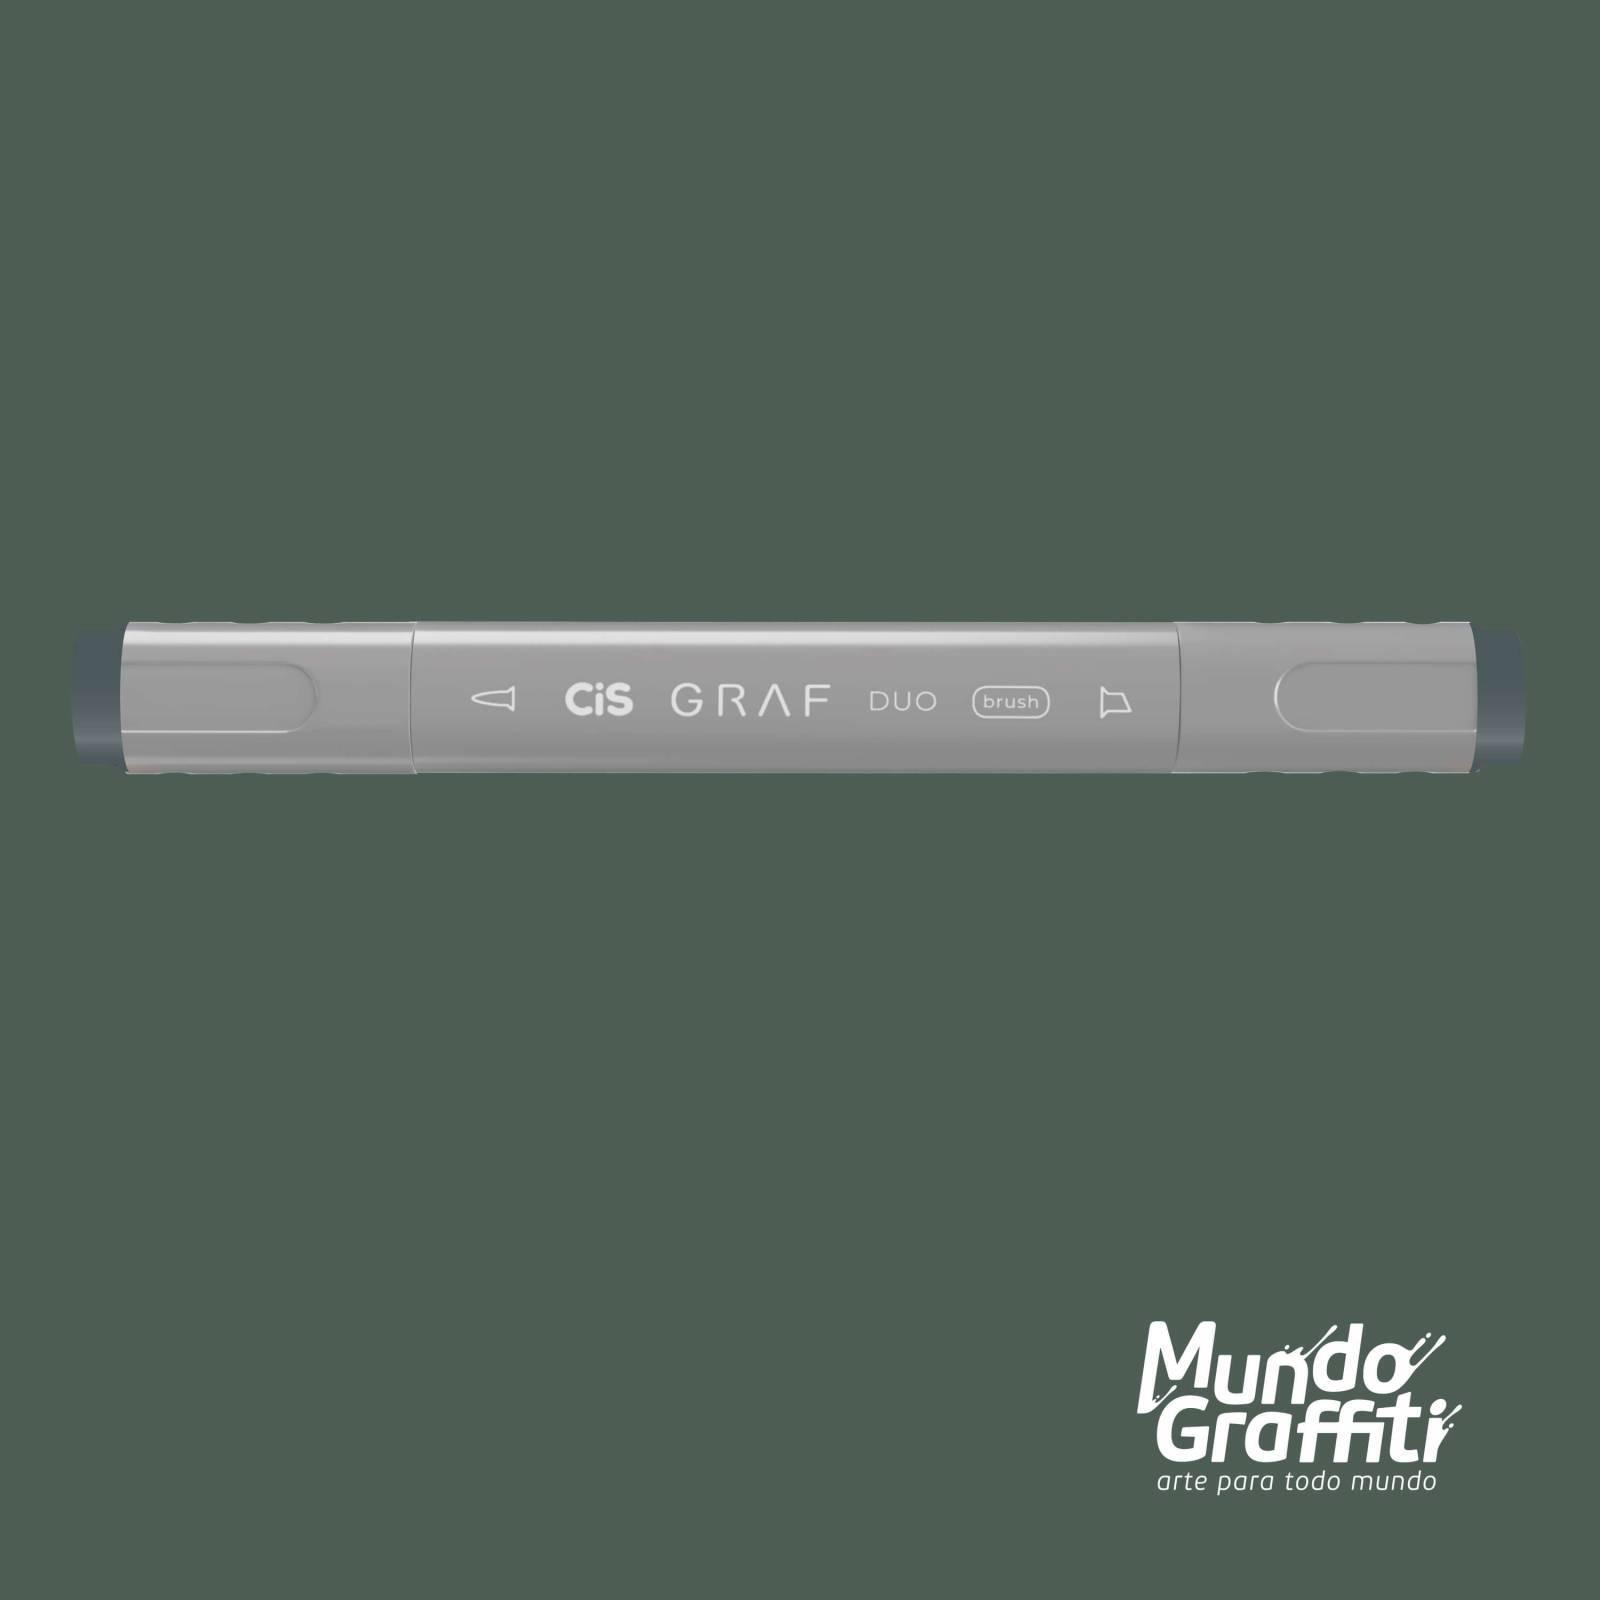 Marcador Cis Graf Duo Brush Green Grey GG5 - Mundo Graffiti